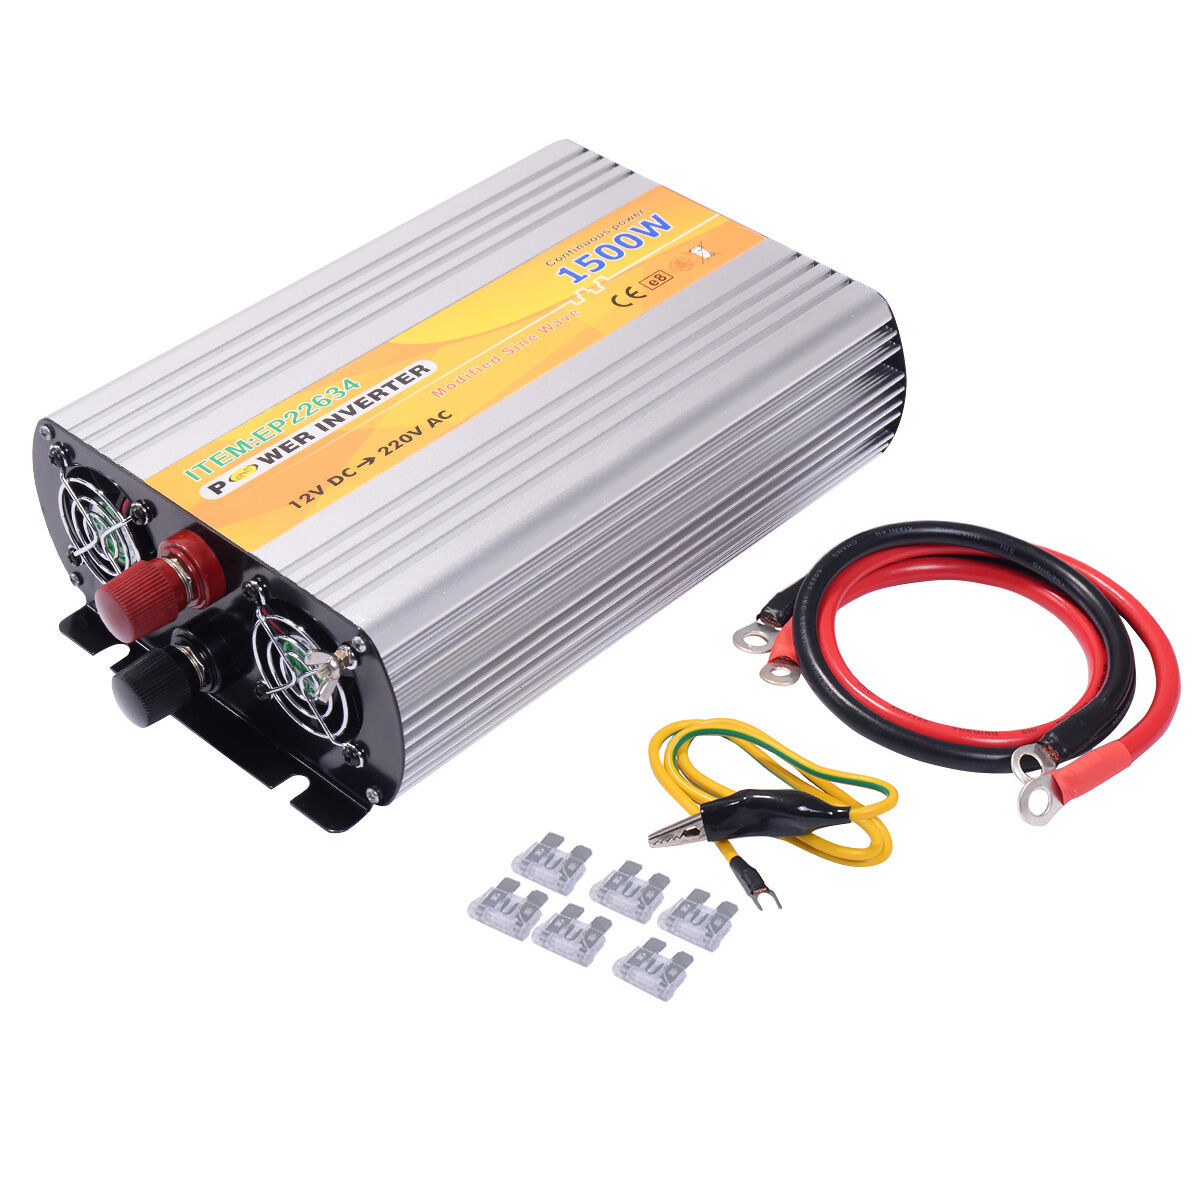 Spannungswandler 1500 3000W Inverter Welchselrichter Stromwandler 12V auf 220V